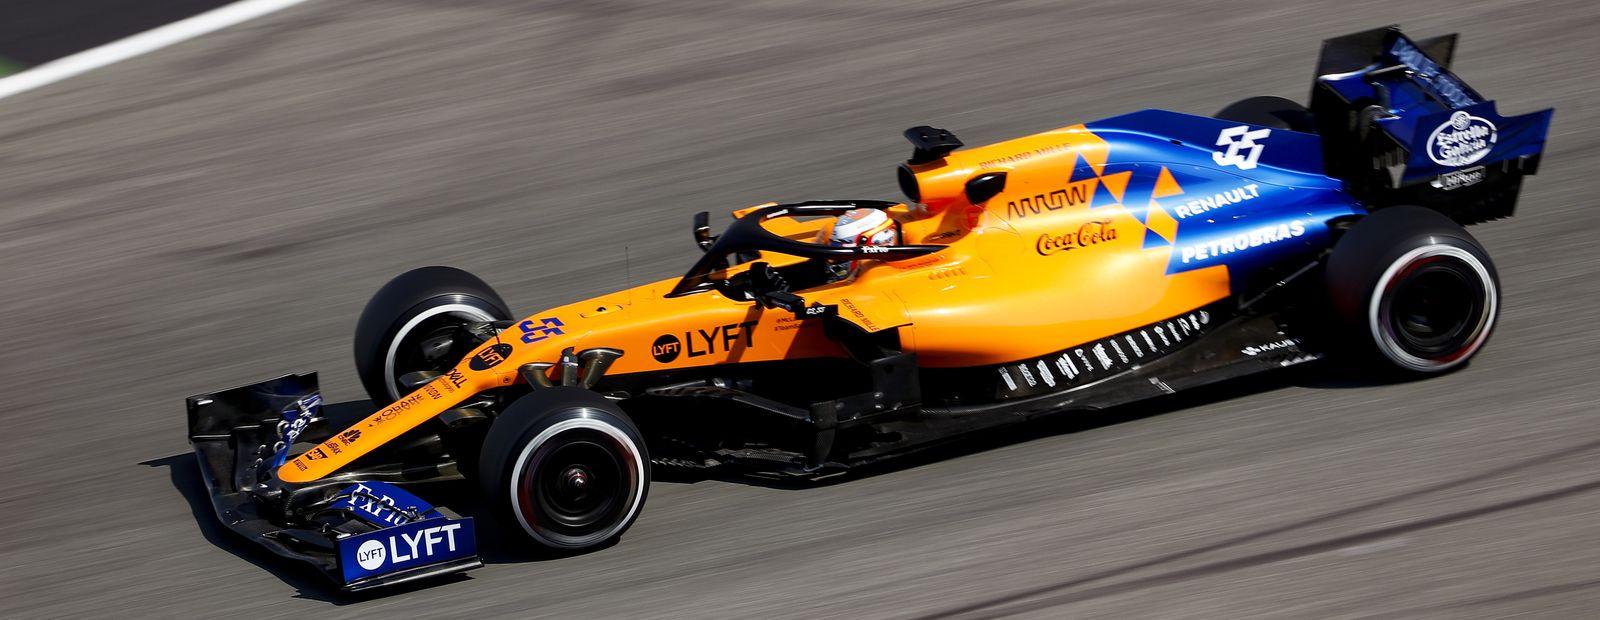 2019 German Grand Prix - Free Practice